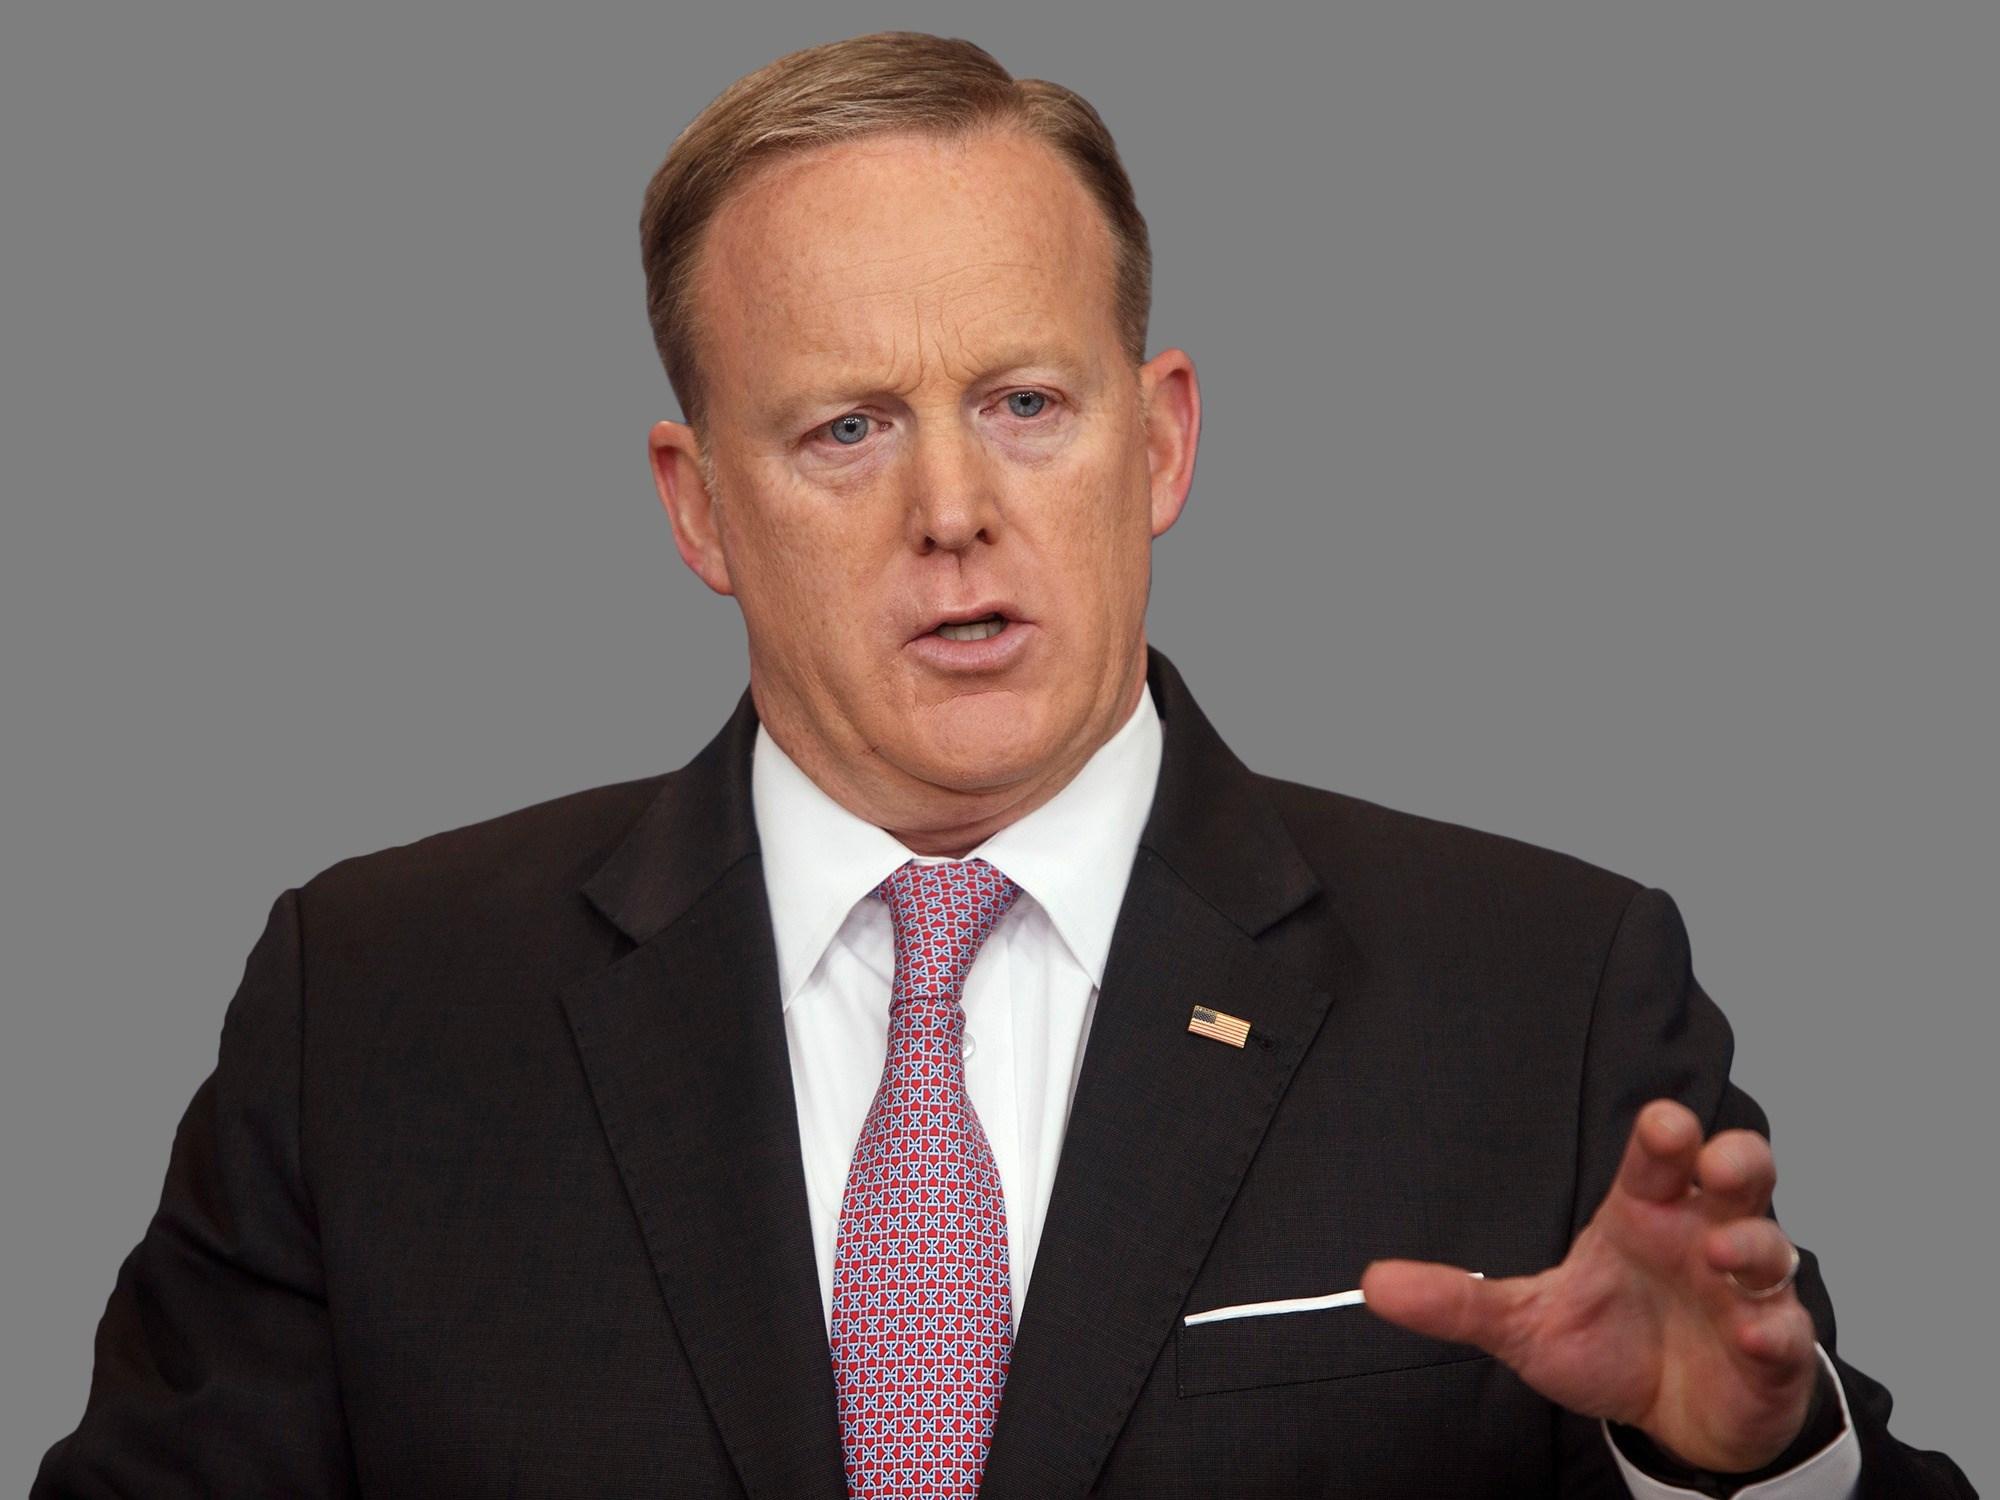 White House Press Secretary Sean Spicer has reportedly resigned.